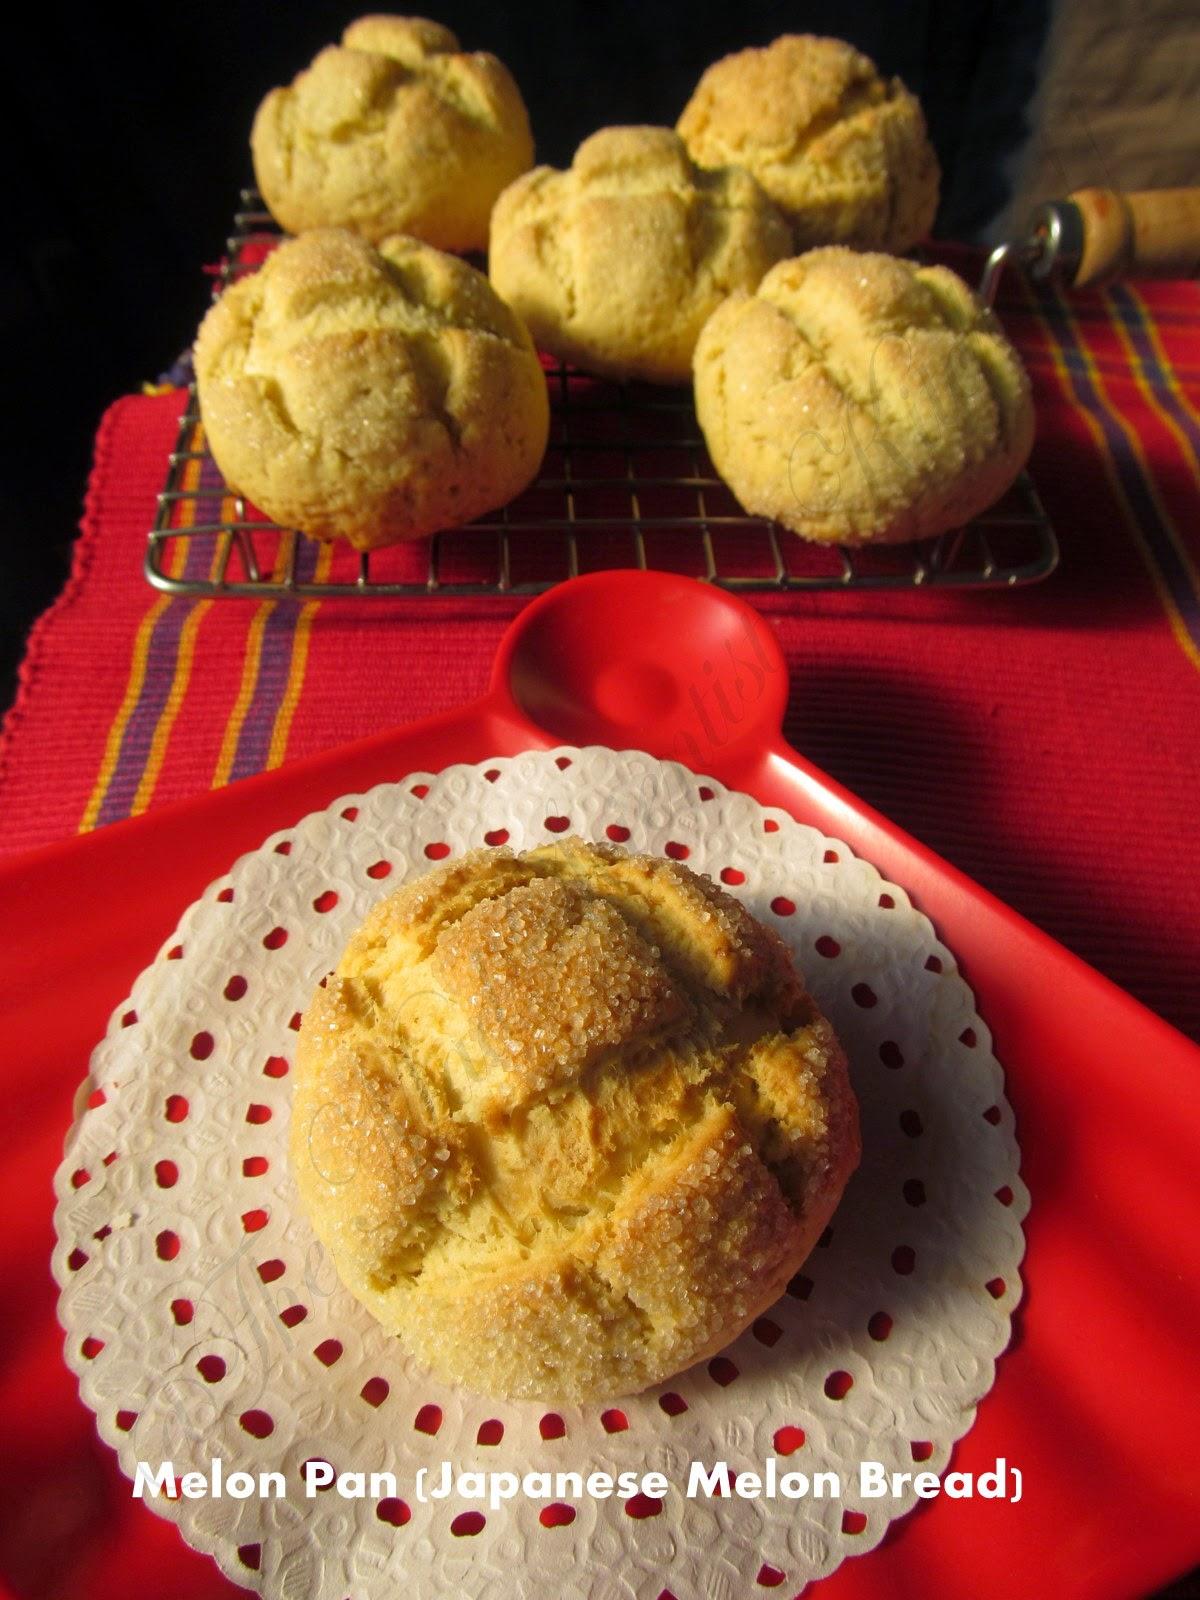 Melon Pan (Japanese Melon Bread)